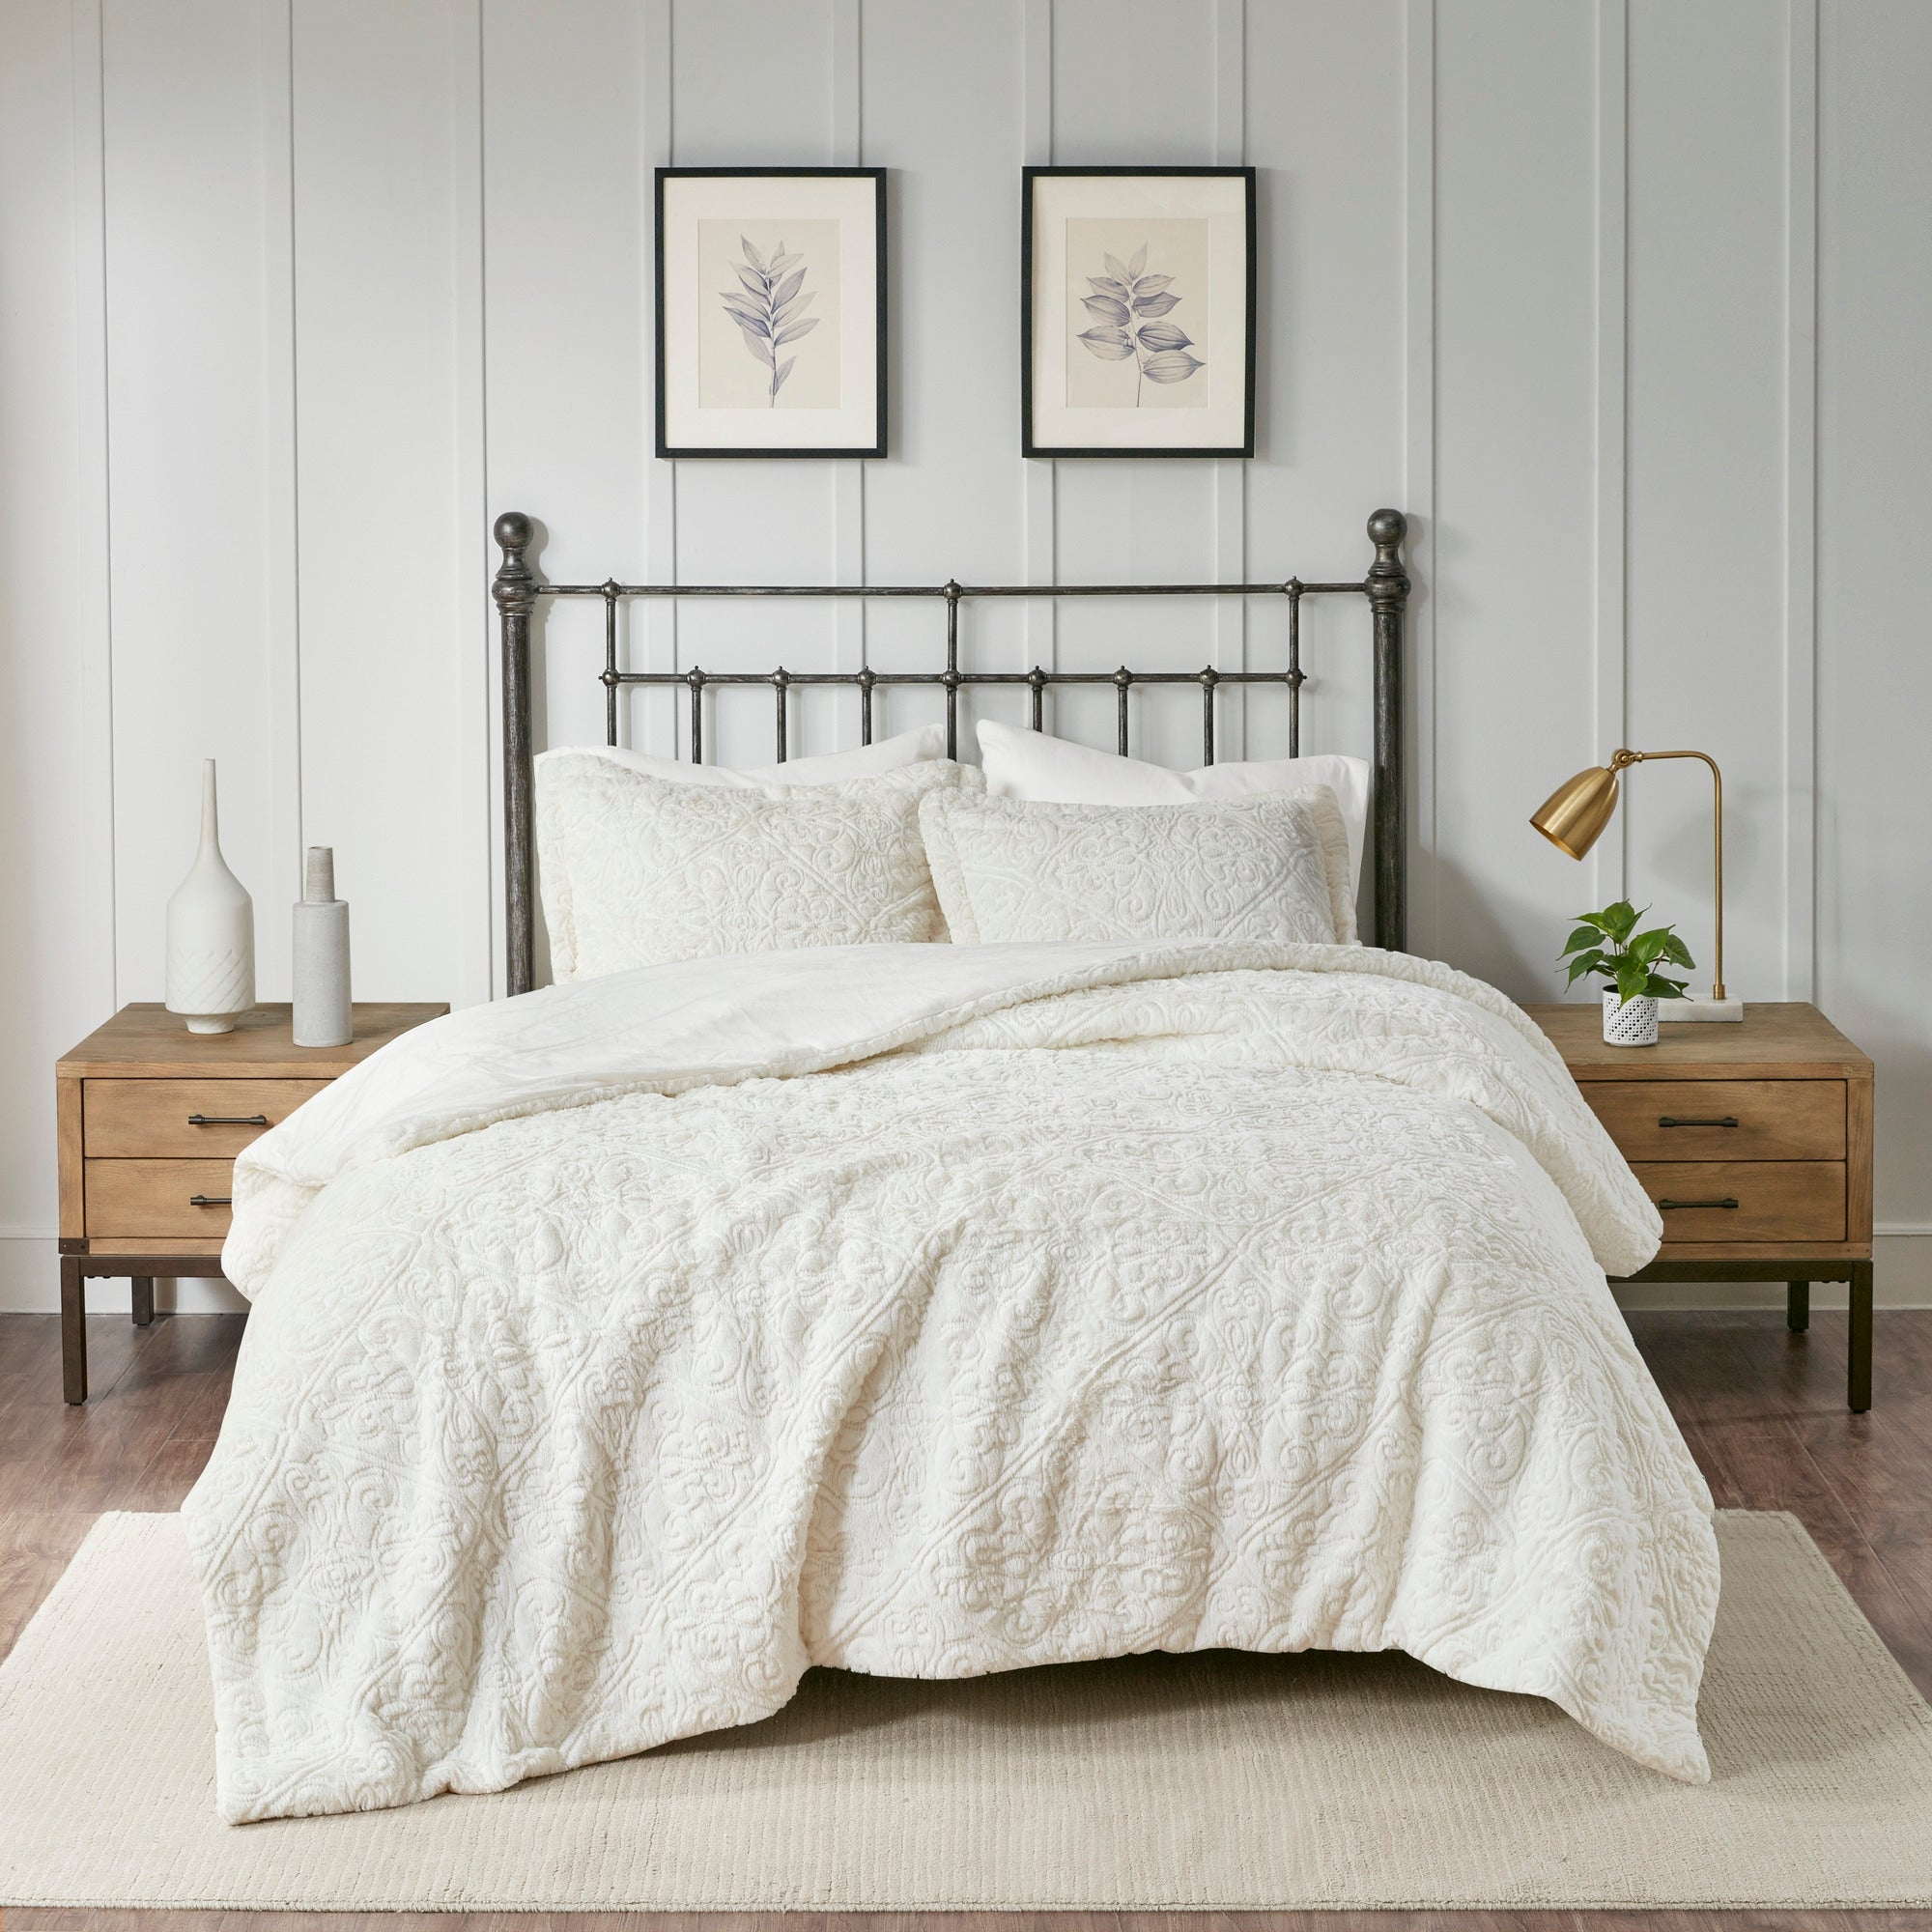 Luxury Grey Ultra Plush Textured Medallion Comforter AND Decorative Shams